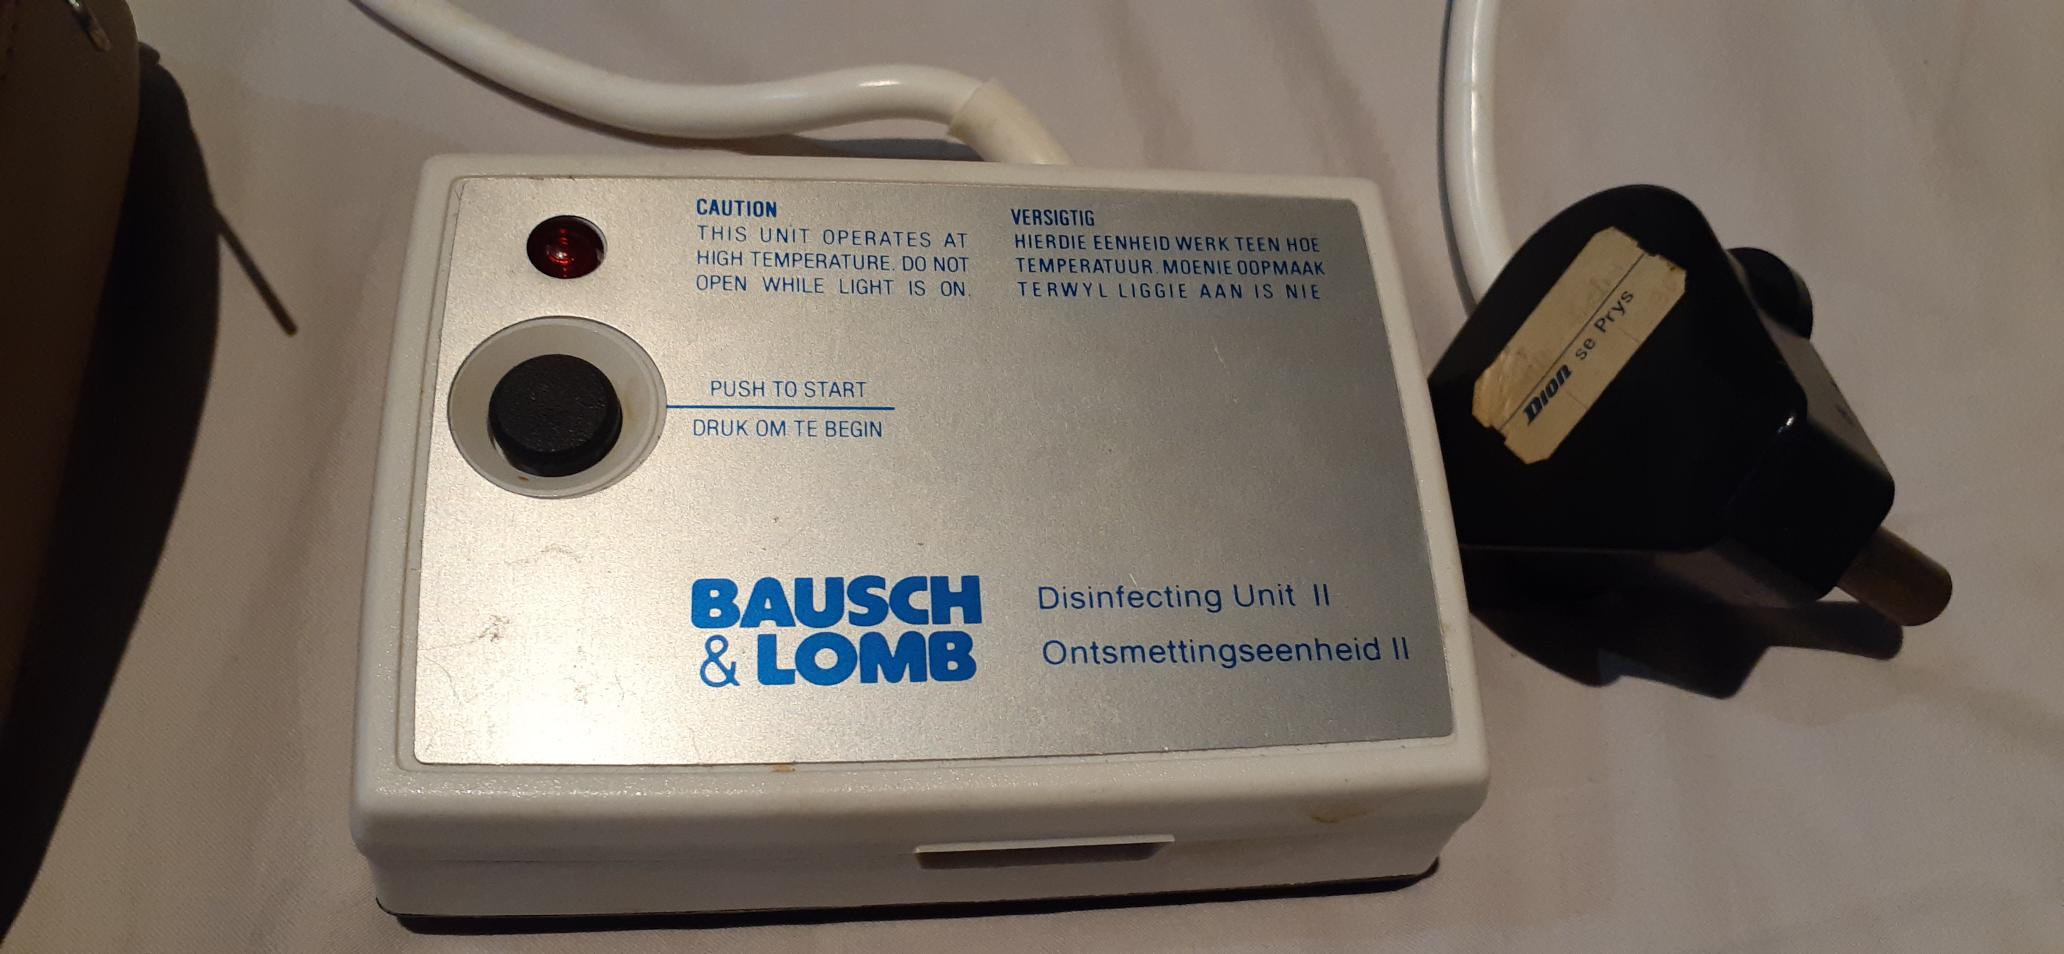 Contact Lens Sterilization Kit